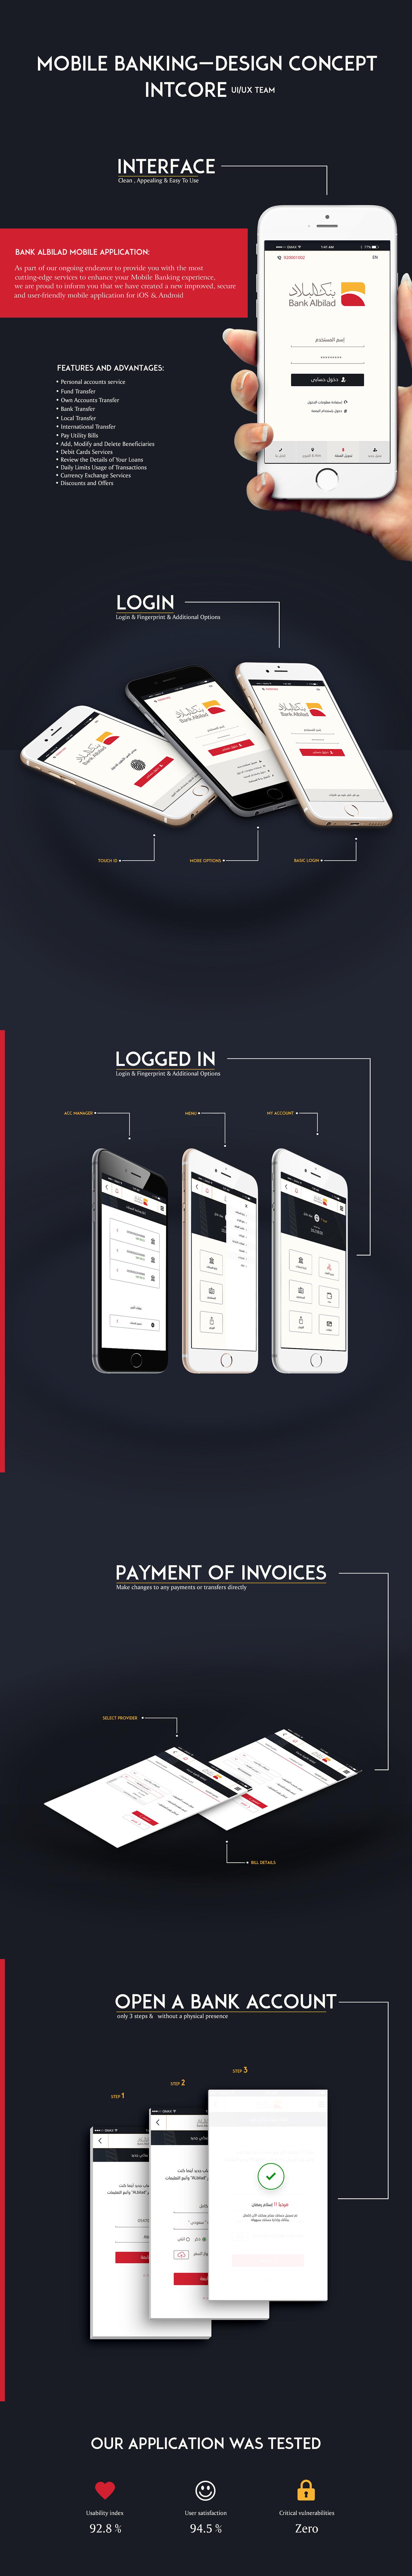 Bank Albilad Design Concept On Behance Concept Design Design Concept